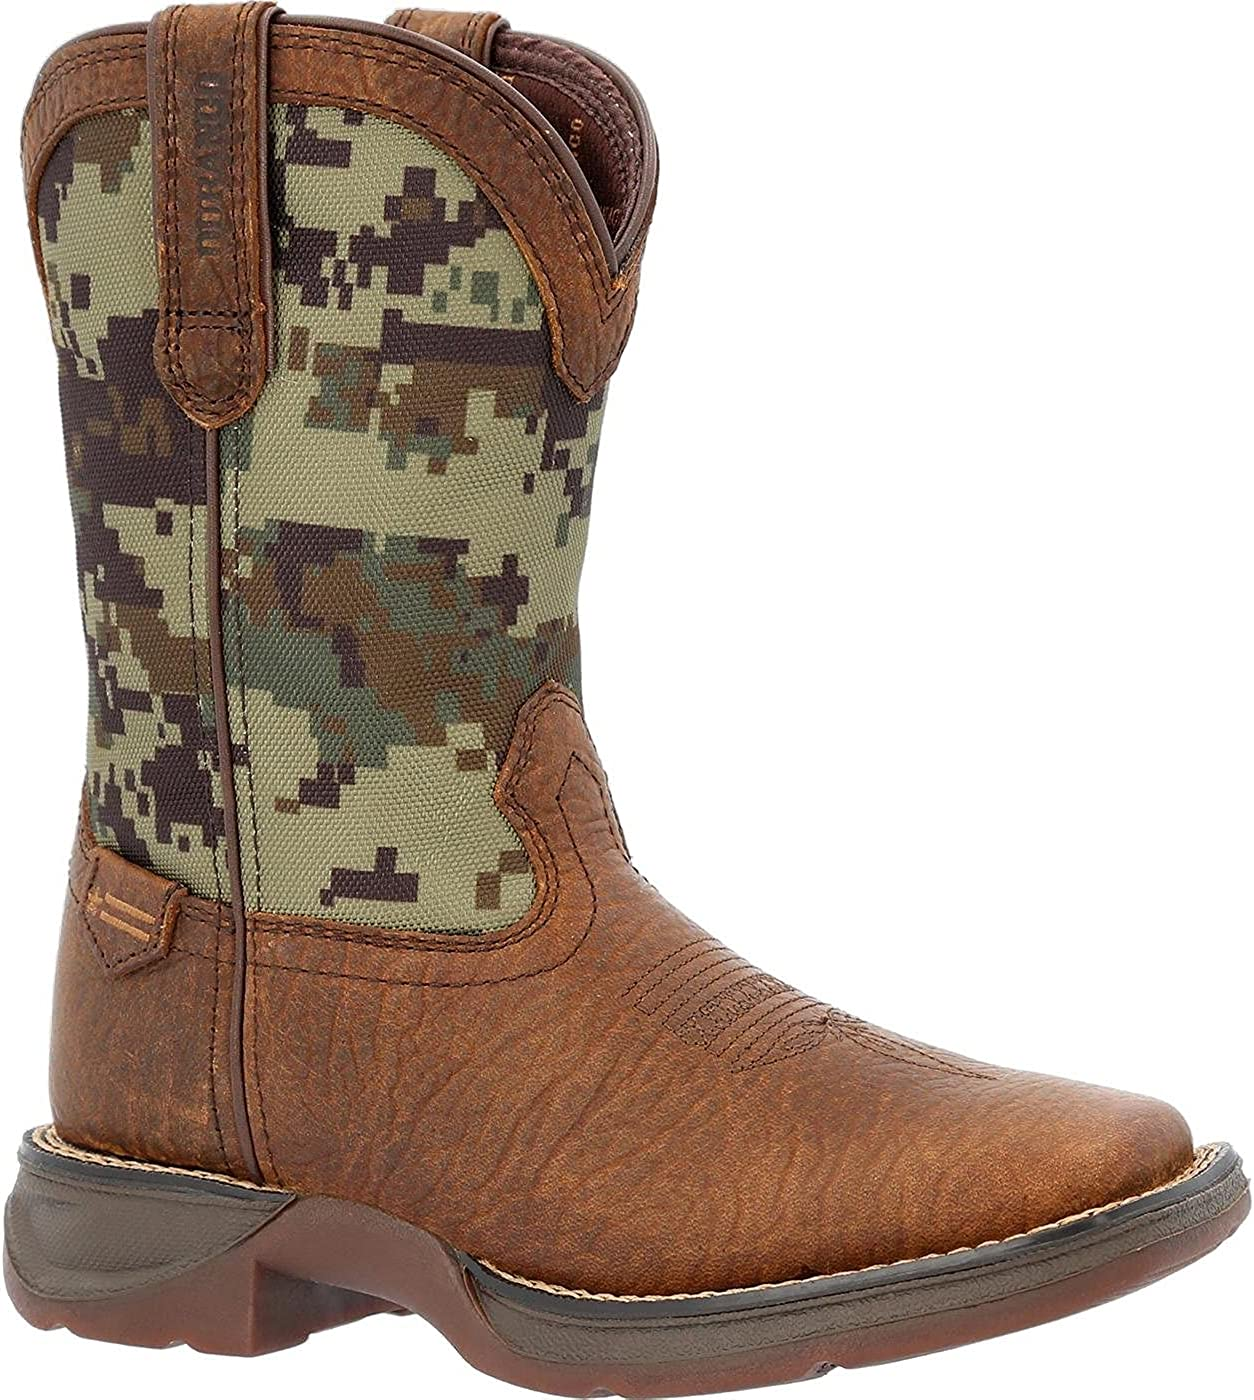 Lil' Durango Little Kids' Digi Camo Western Boot